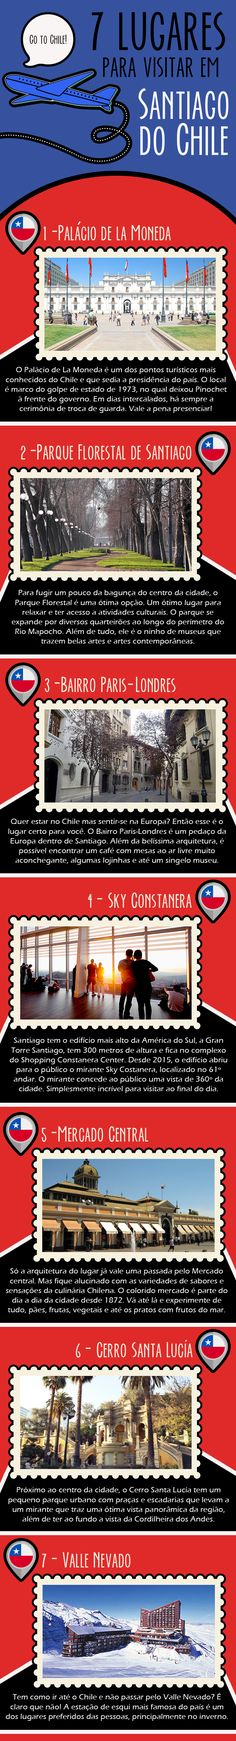 #SevenList #CabideColorido #Art #Infográfico #Design #Viagem #SantiagodoChile…